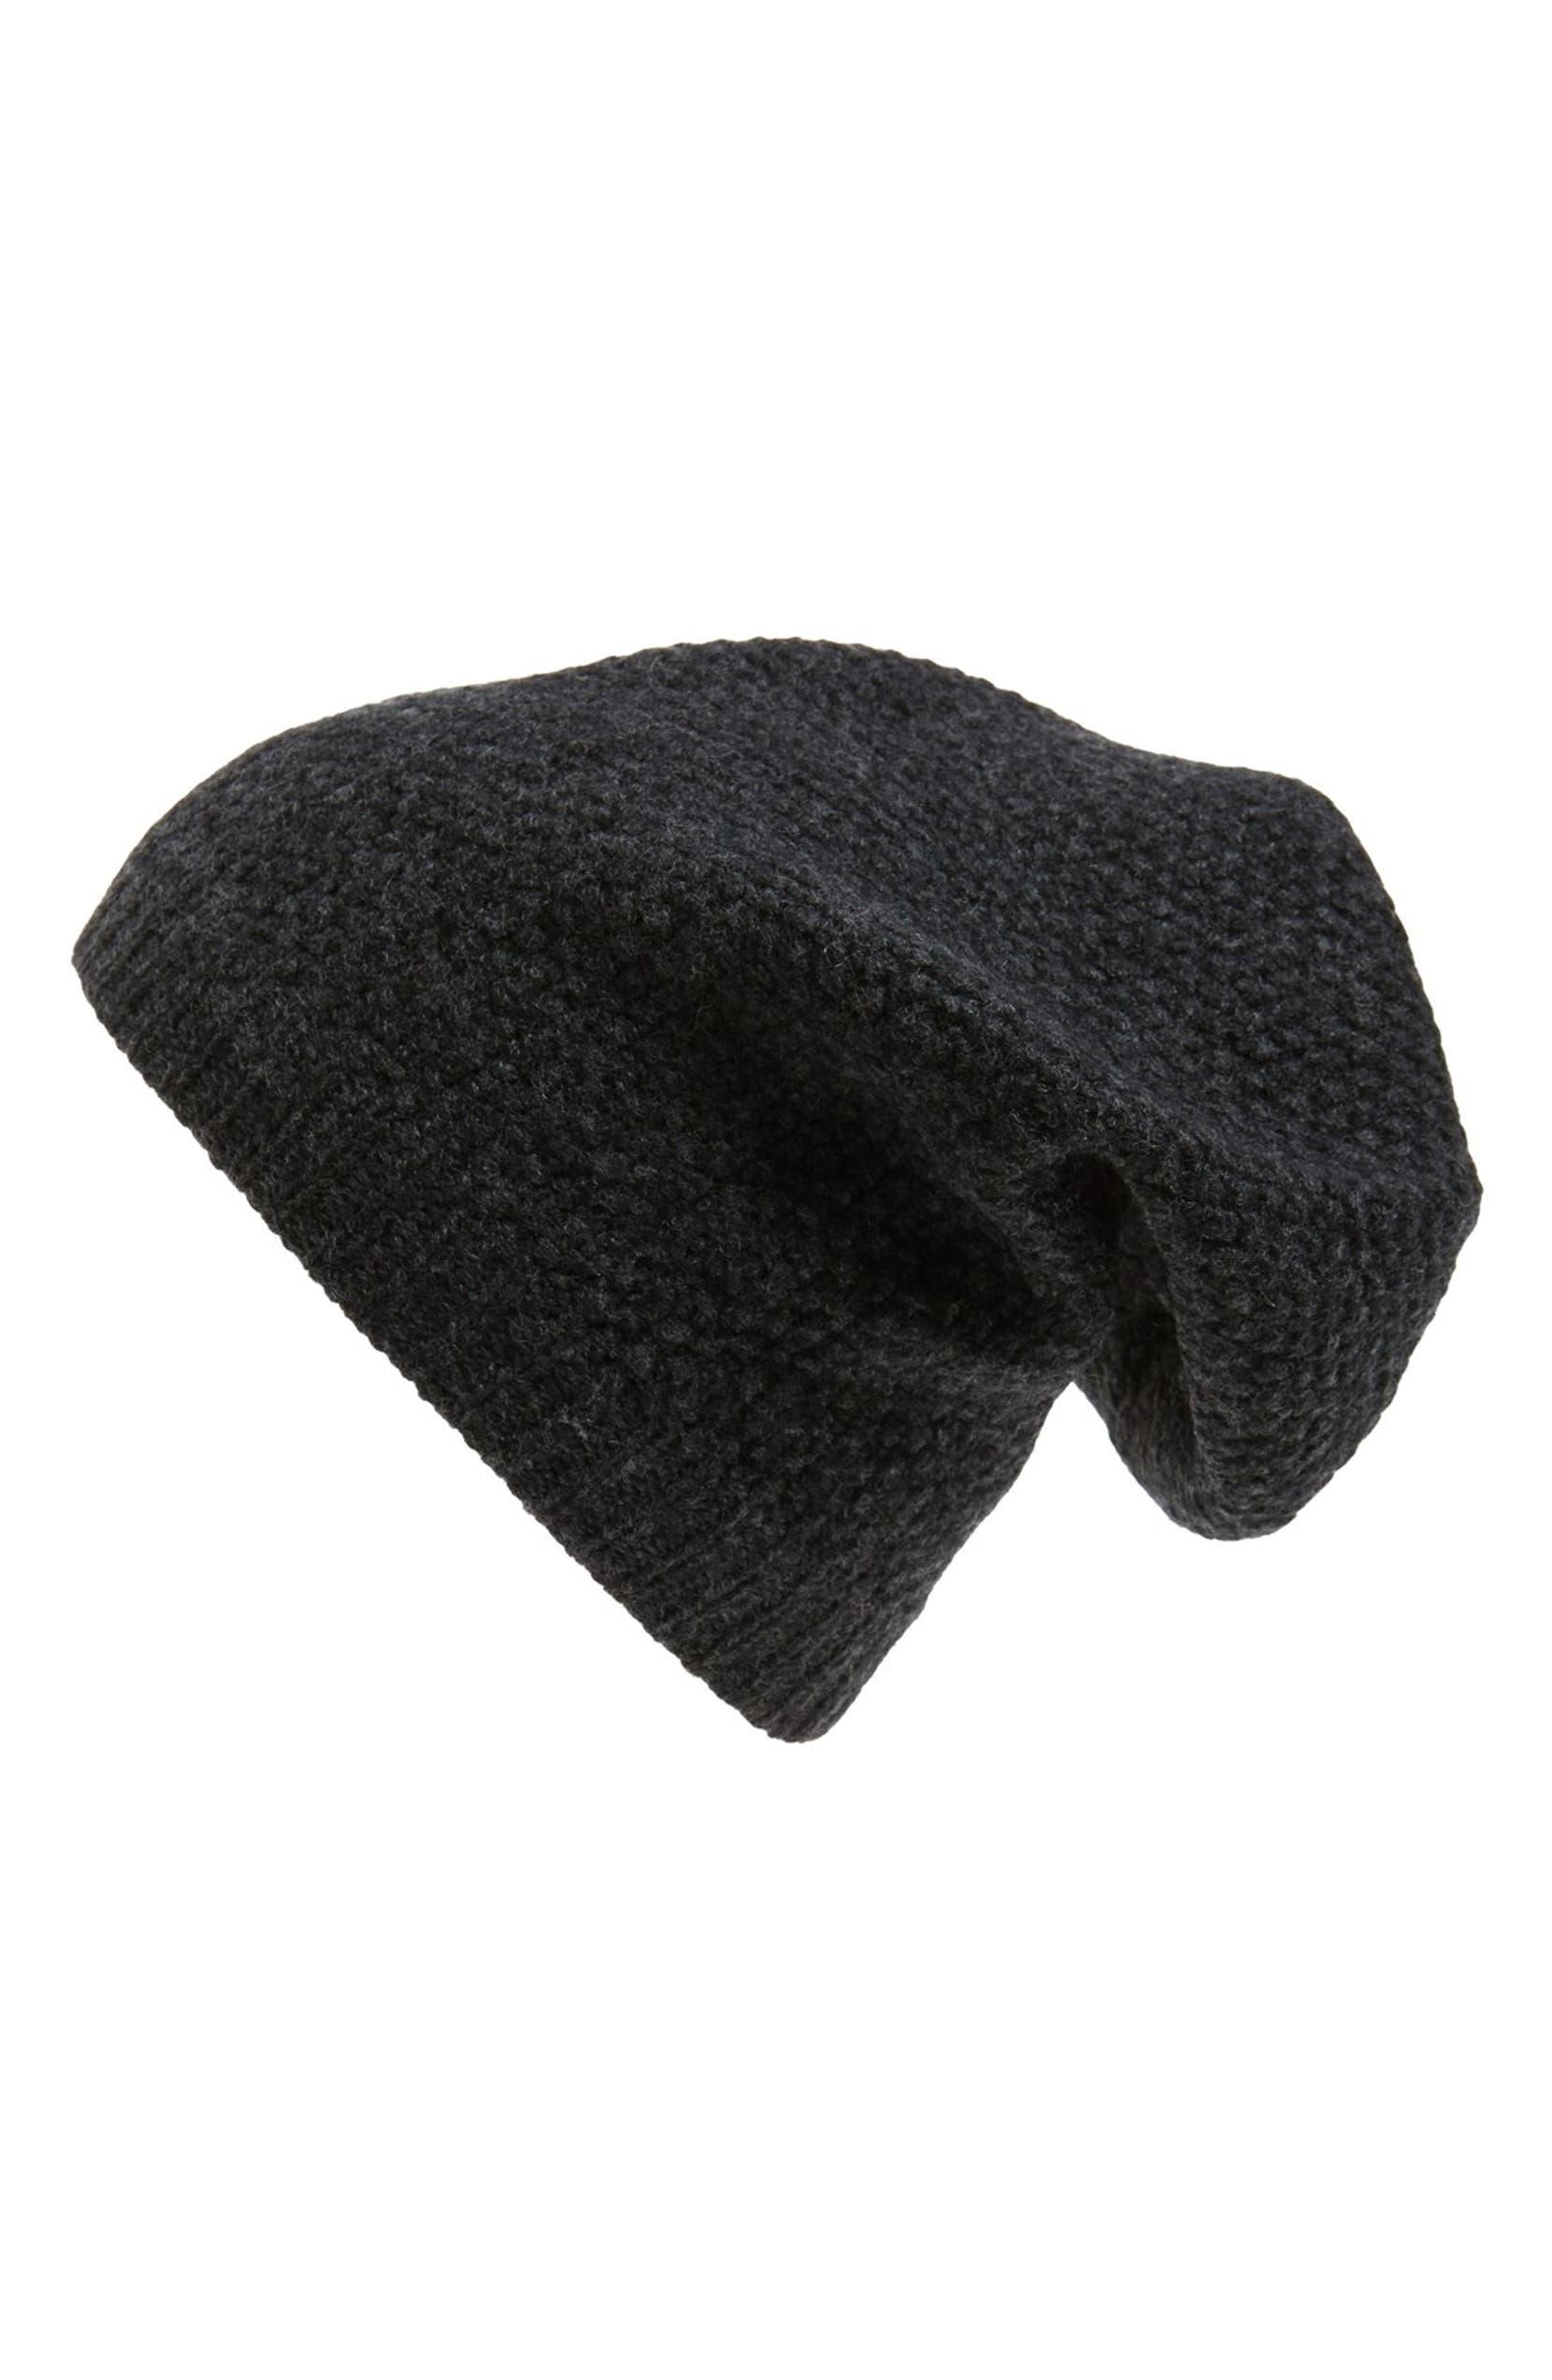 de910bb5fc3 Sole Society Knit Beanie